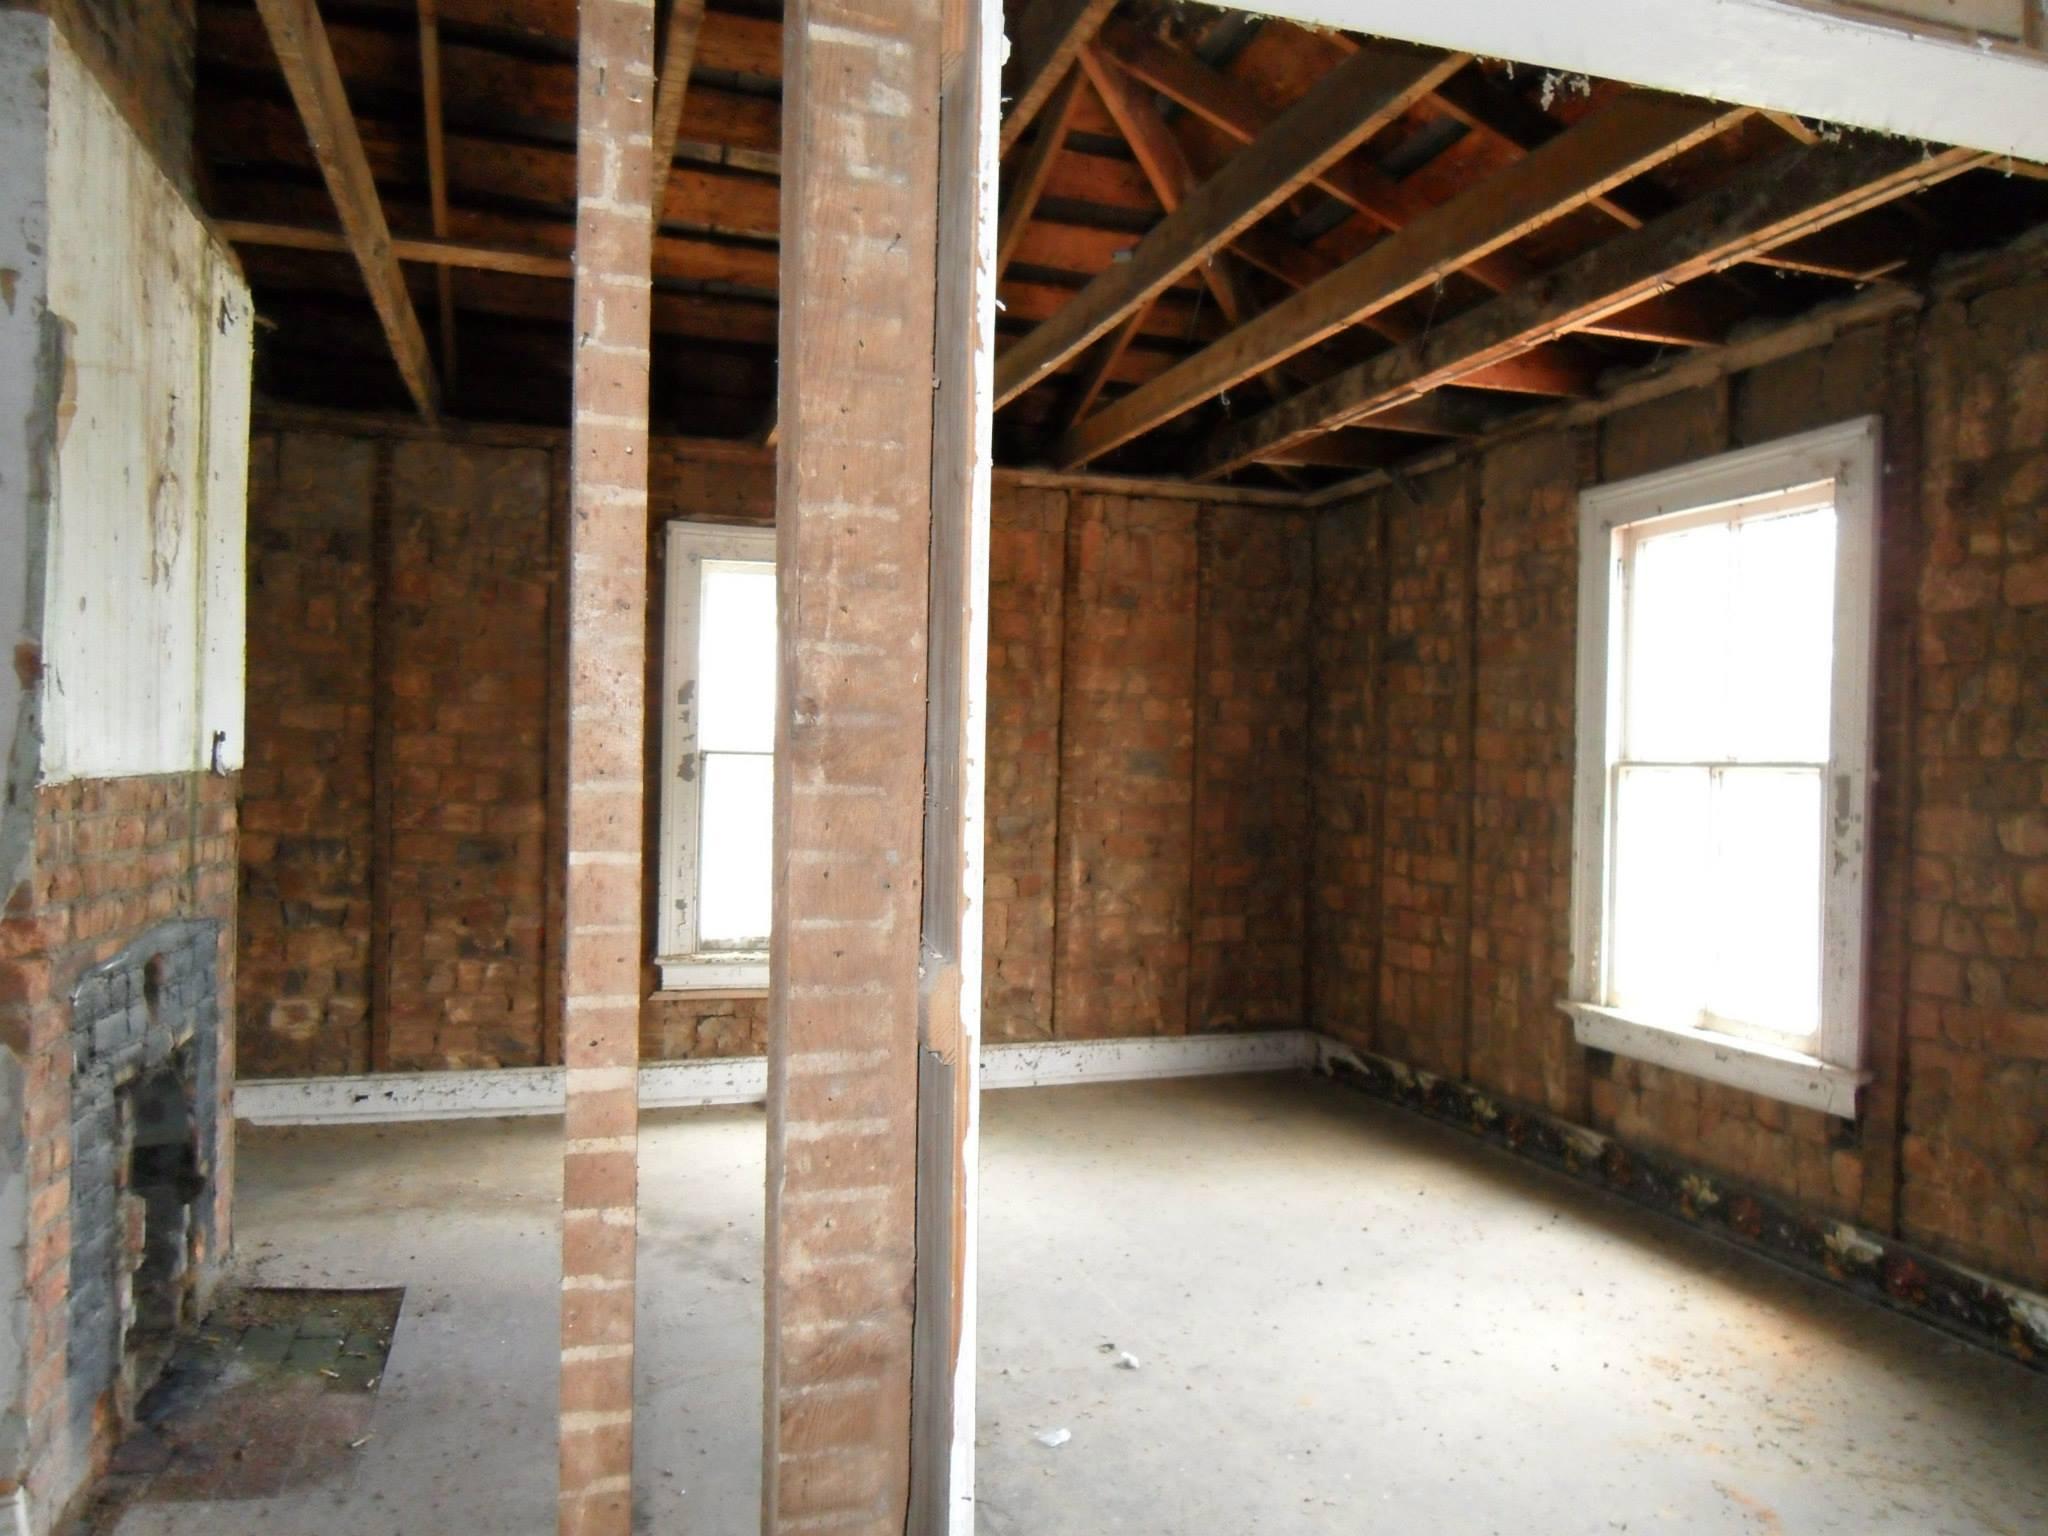 619 frederick st before renovation - bedroom